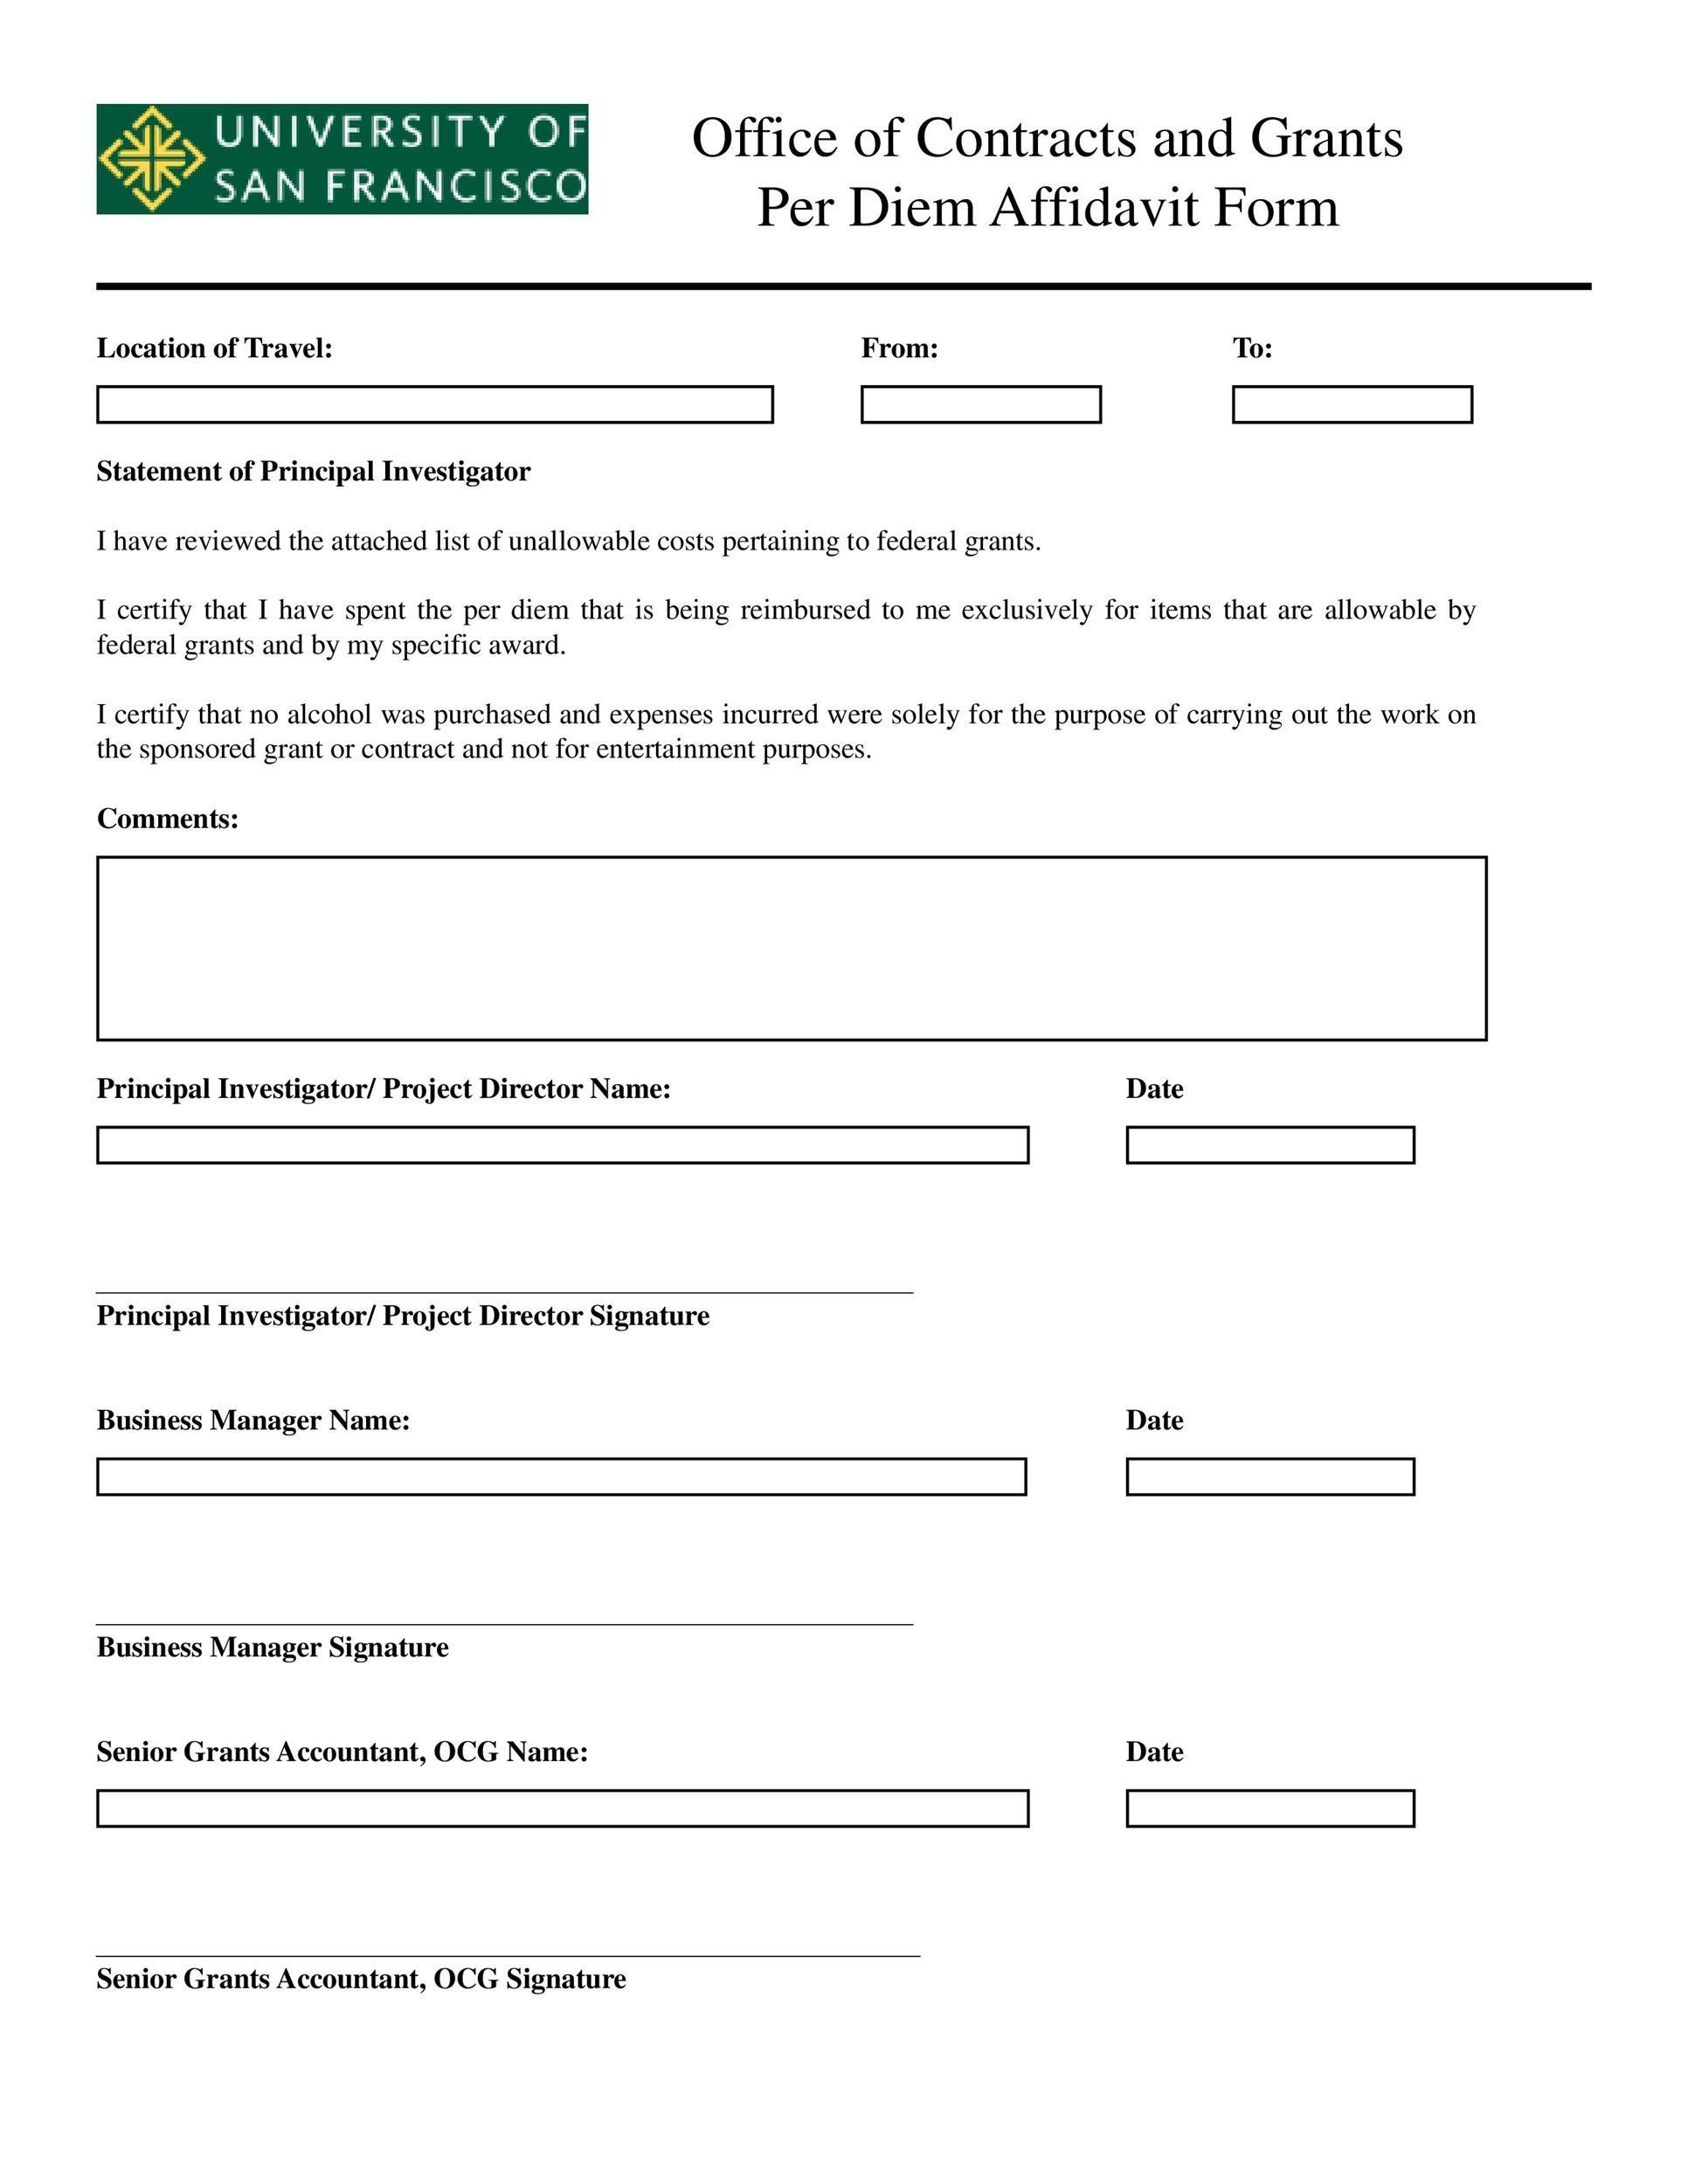 affidavit form 37